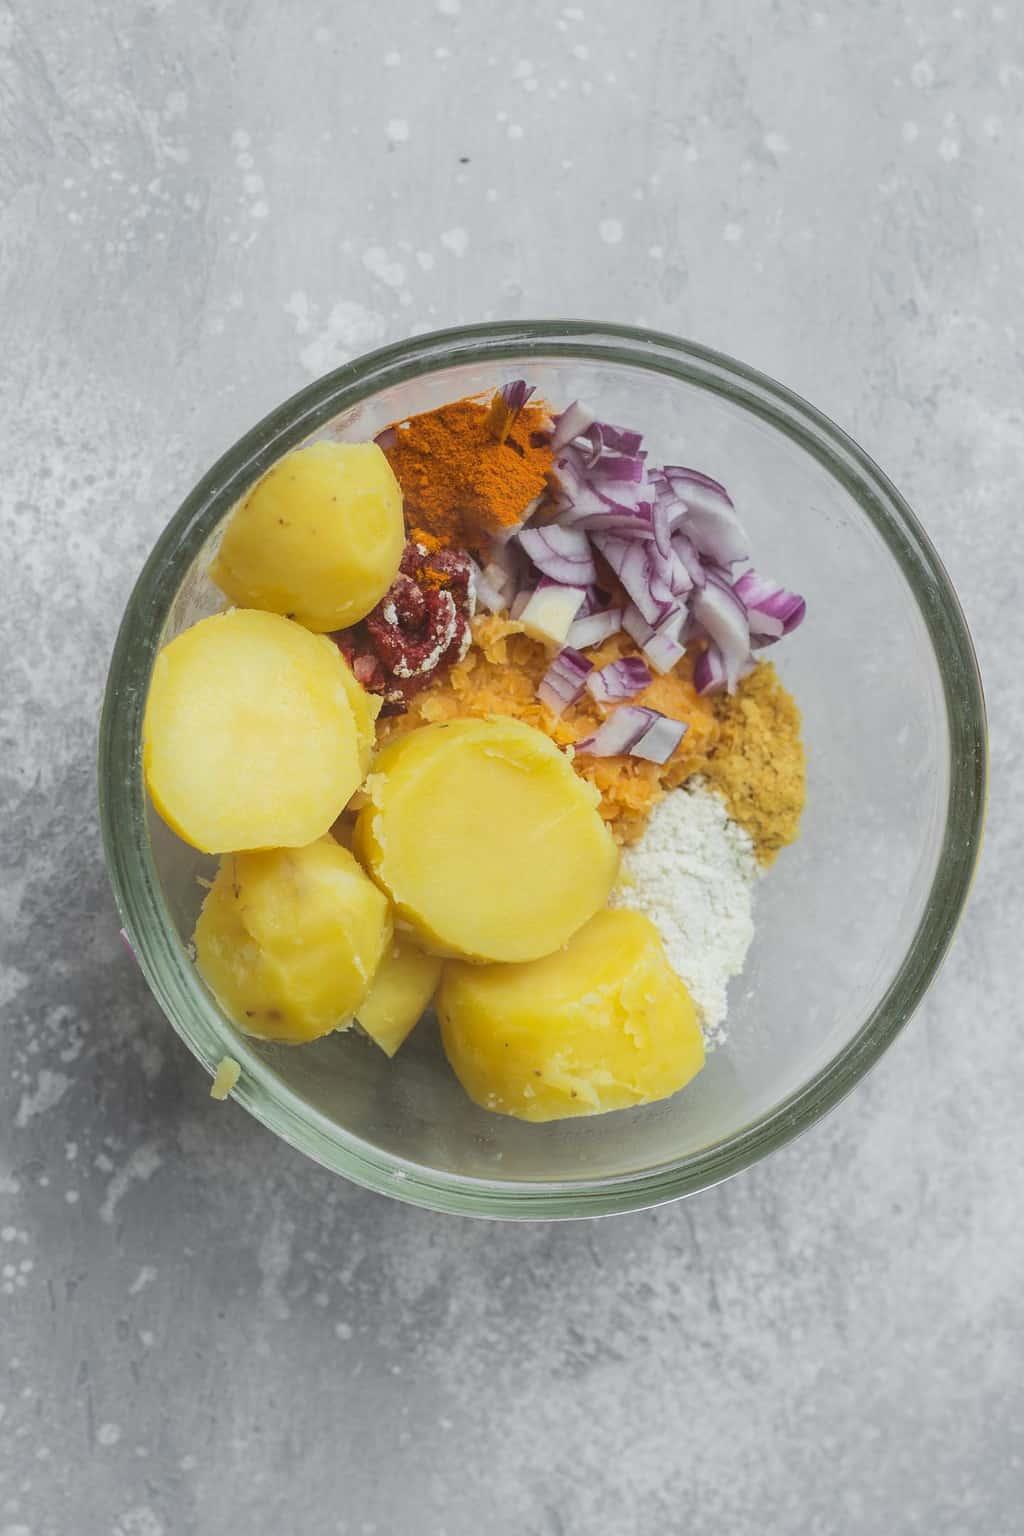 How to make vegan lentil meatballs